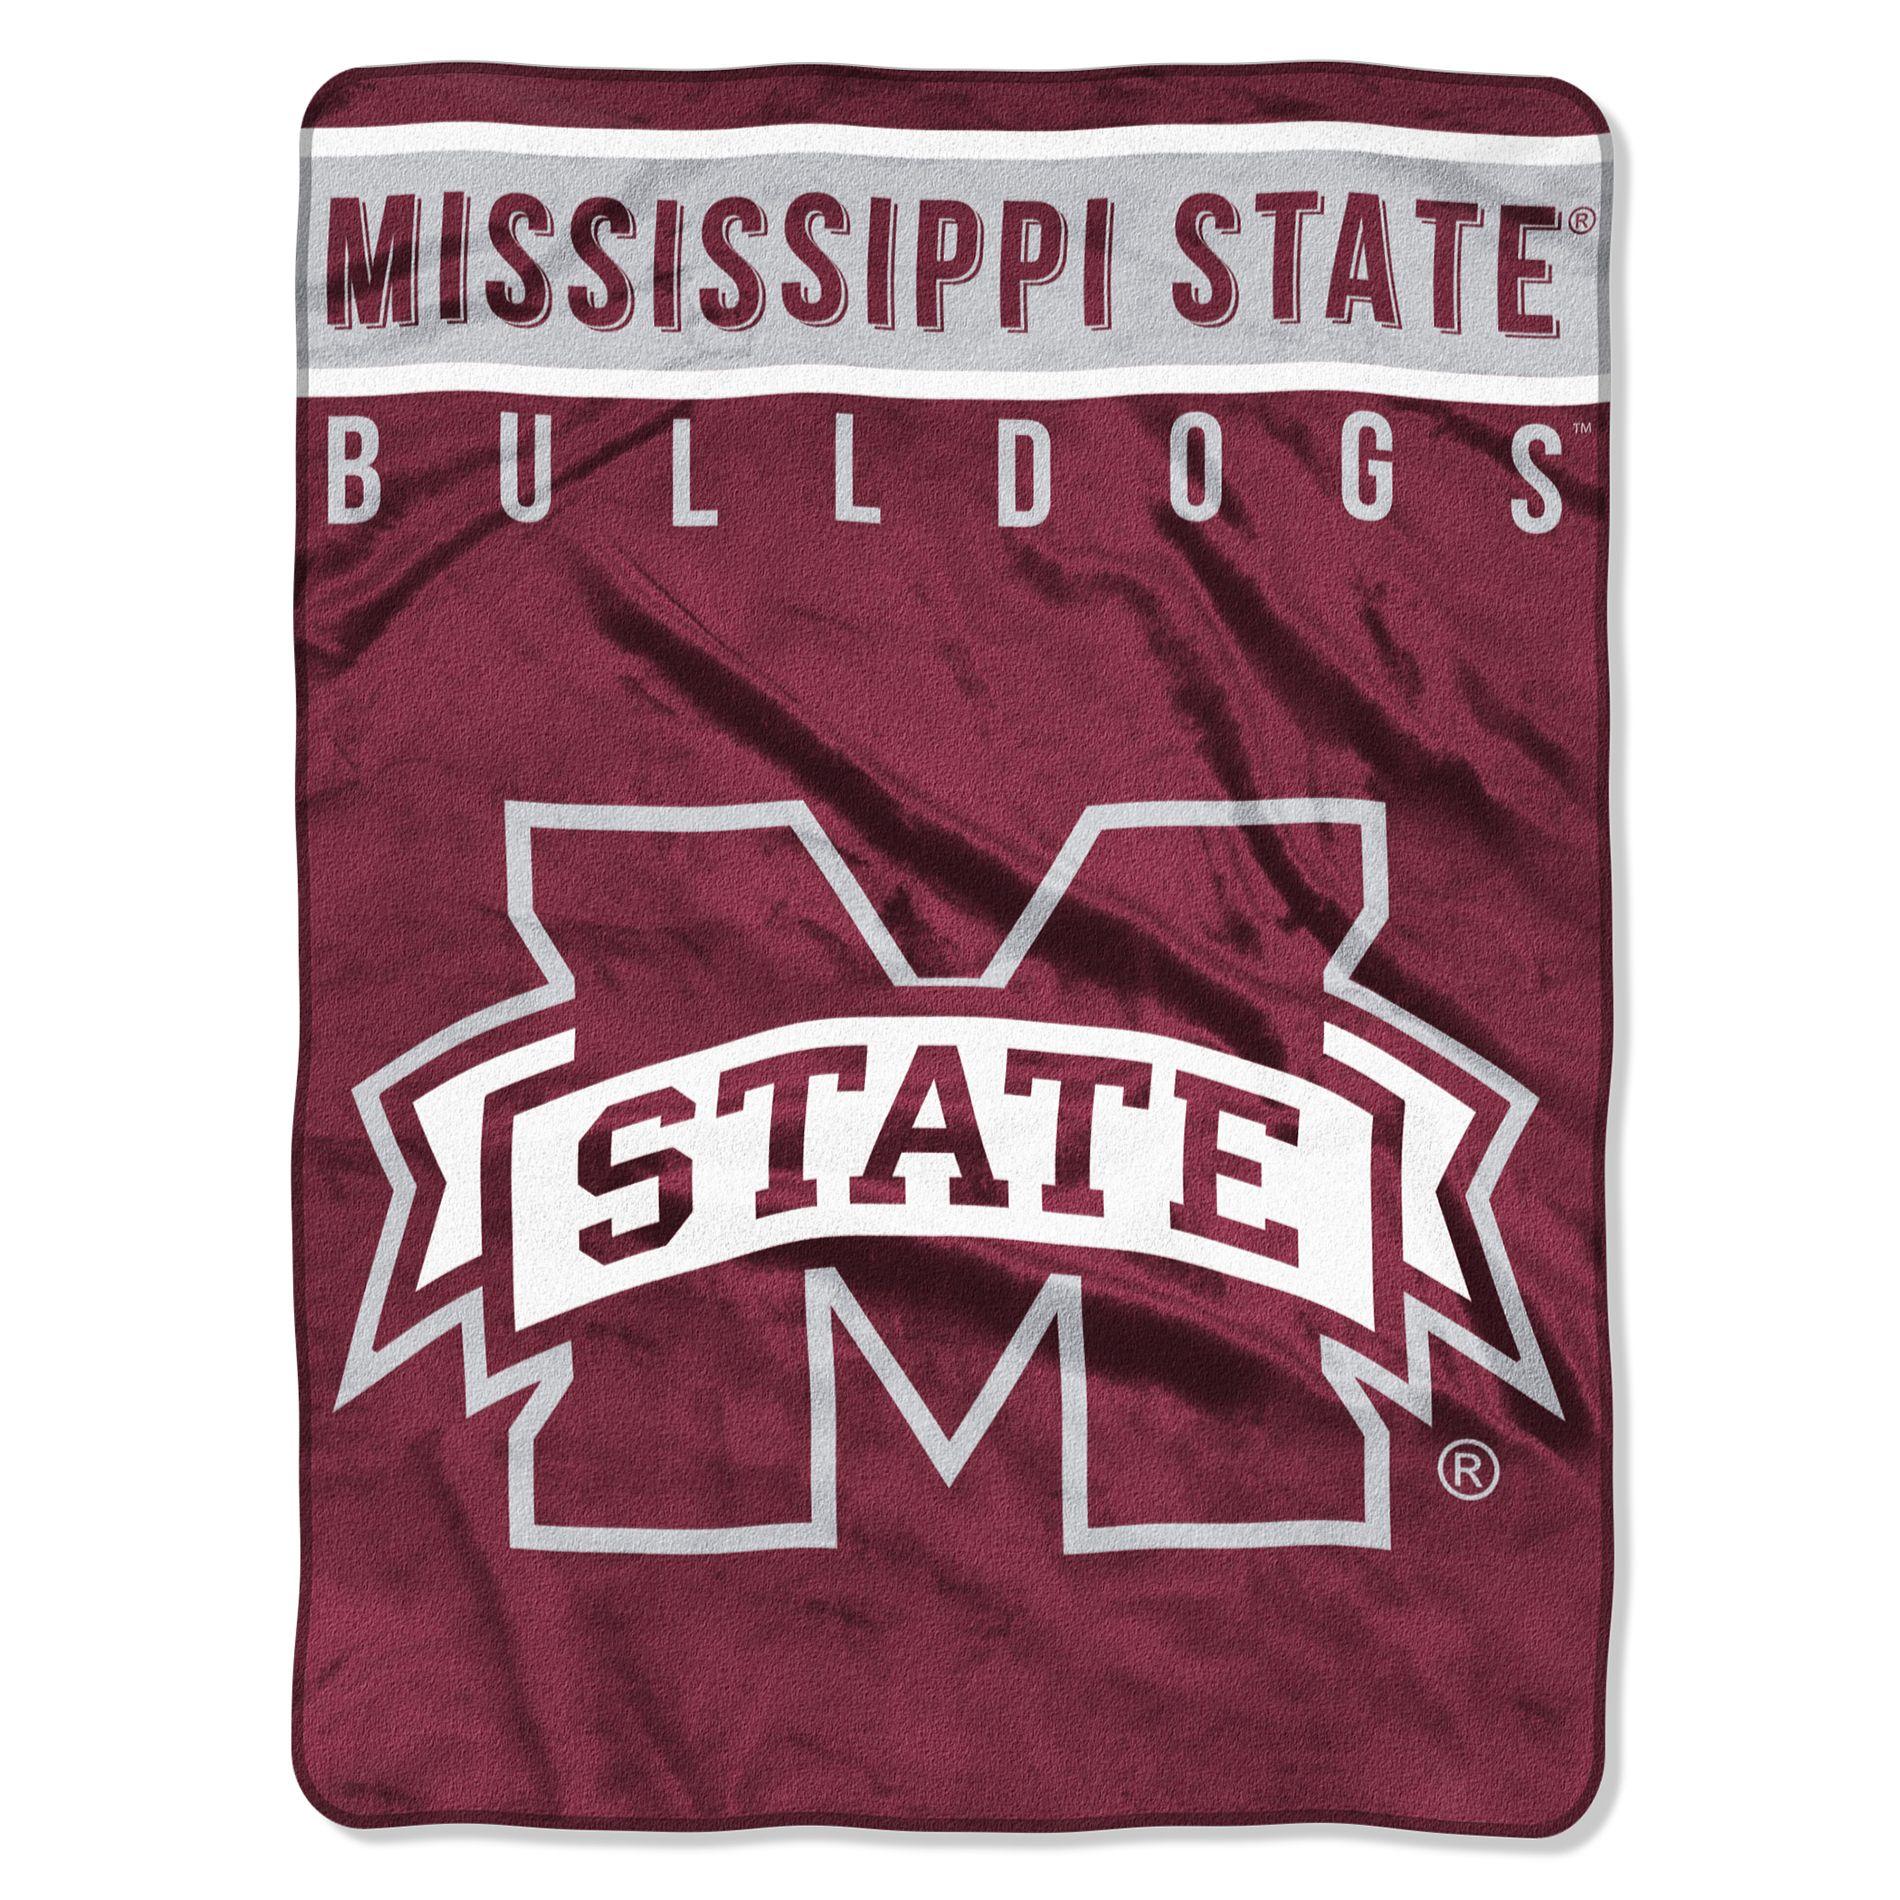 Ncaa Royal Plush Throw Blanket - Mississippi State Bulldogs